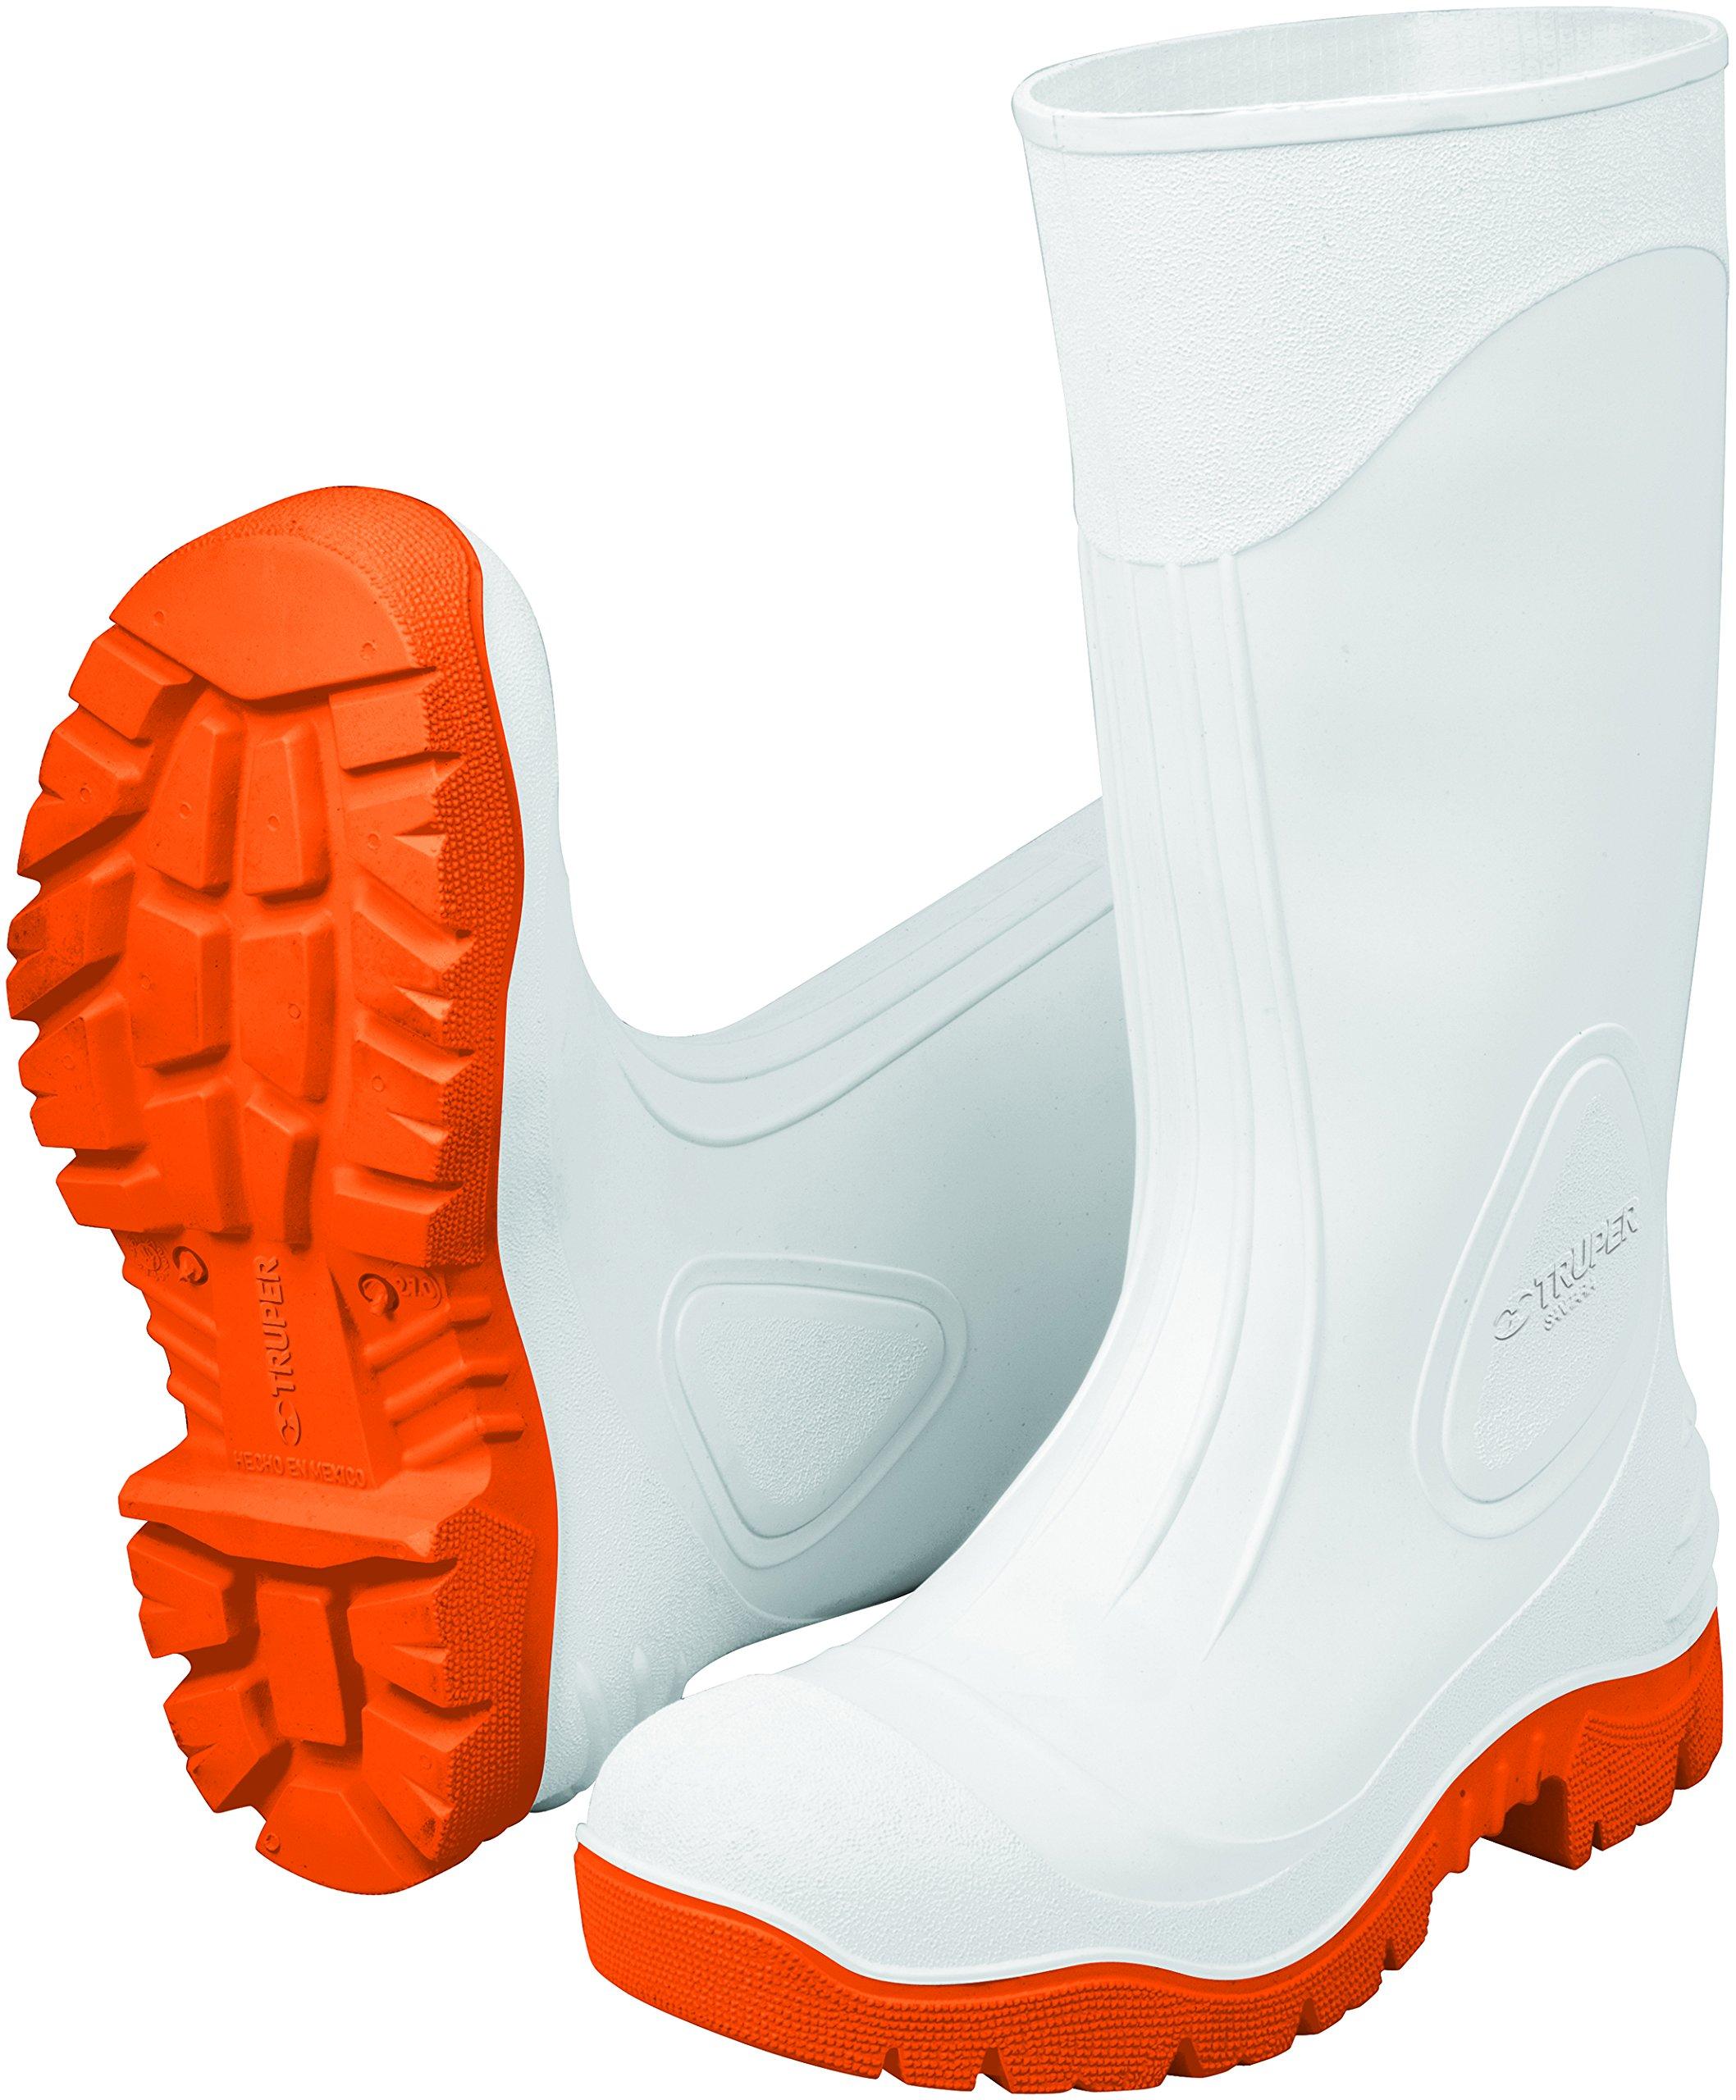 TRUPER BOT-27S White Rubber Work Boots. Size 9